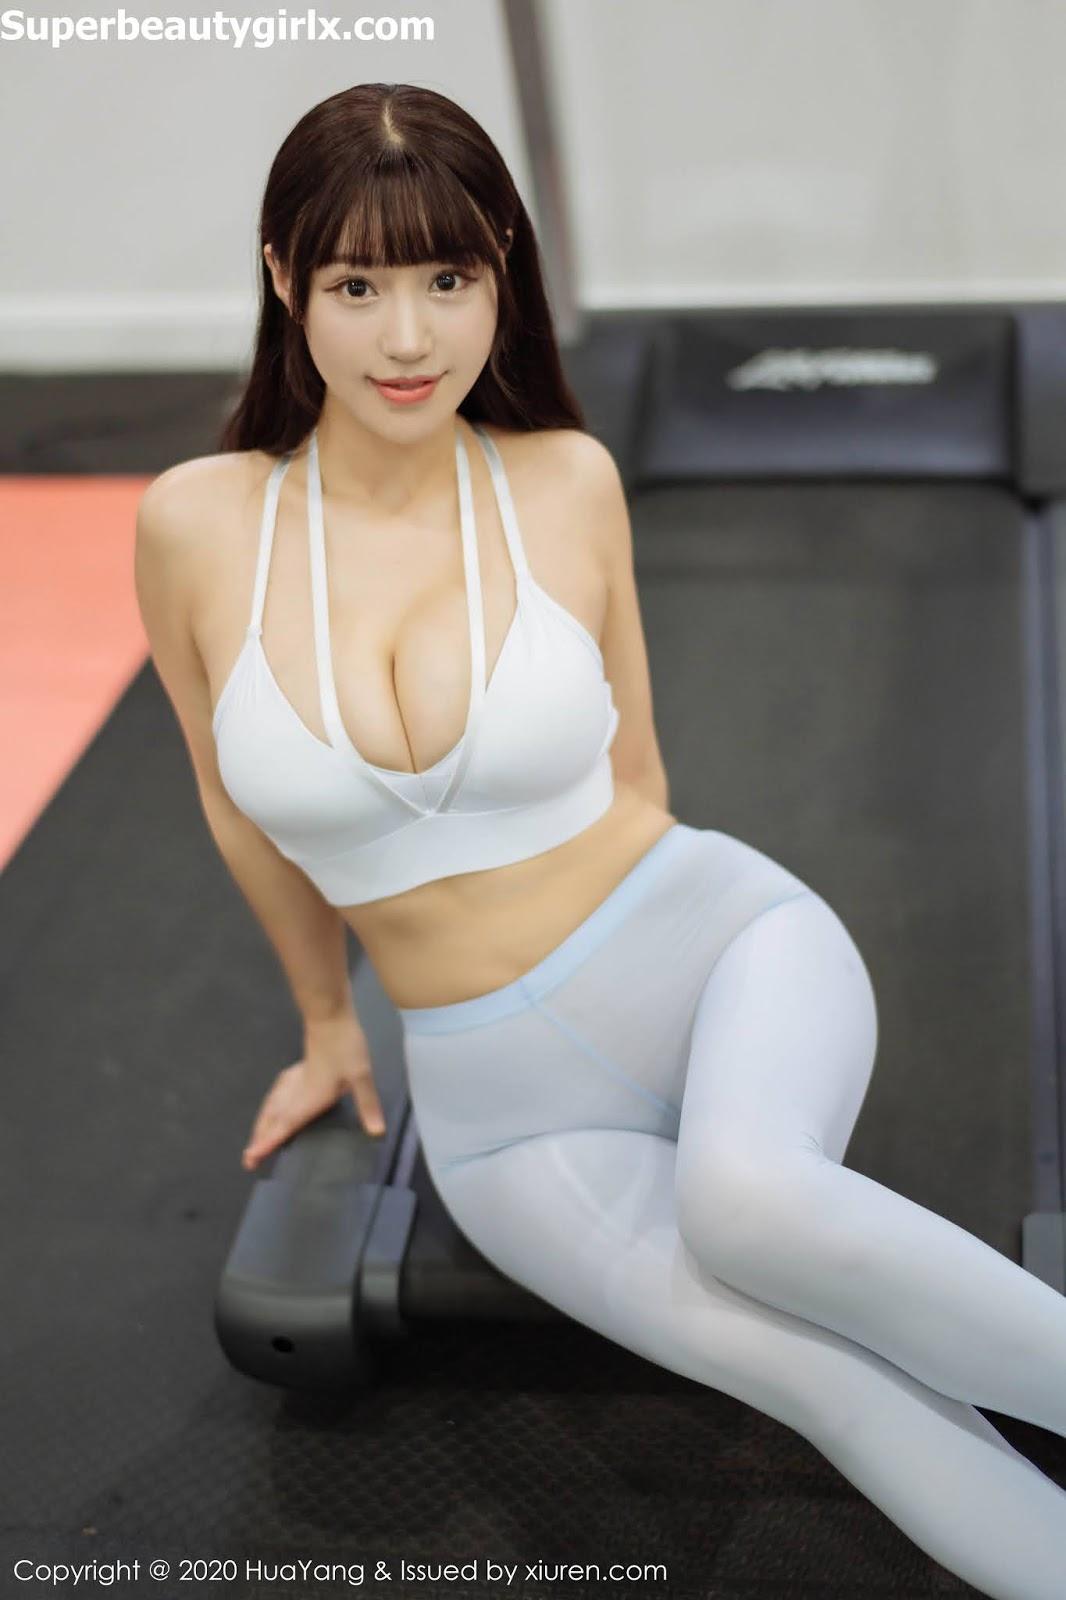 HuaYang-Vol.235-Zhu-Ke-Er-Flower-Superbeautygirlx.com